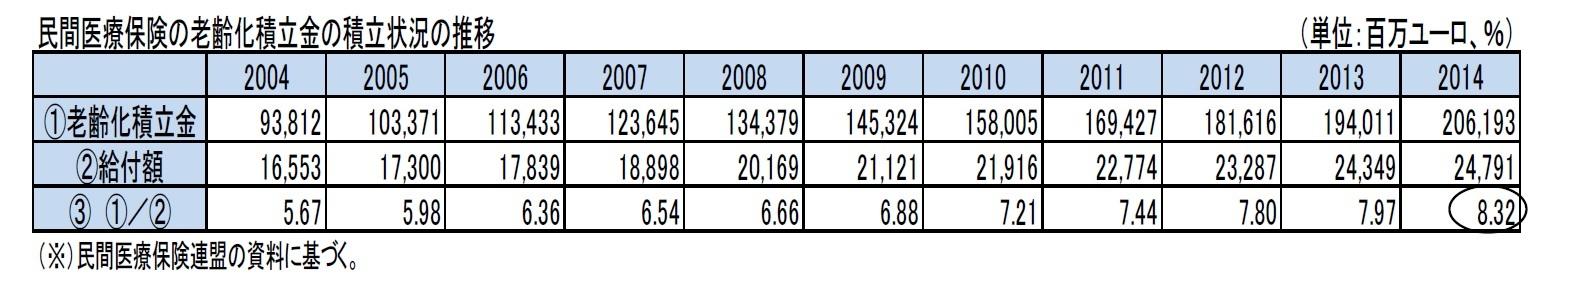 民間医療保険の老齢化積立金の積立状況の推移